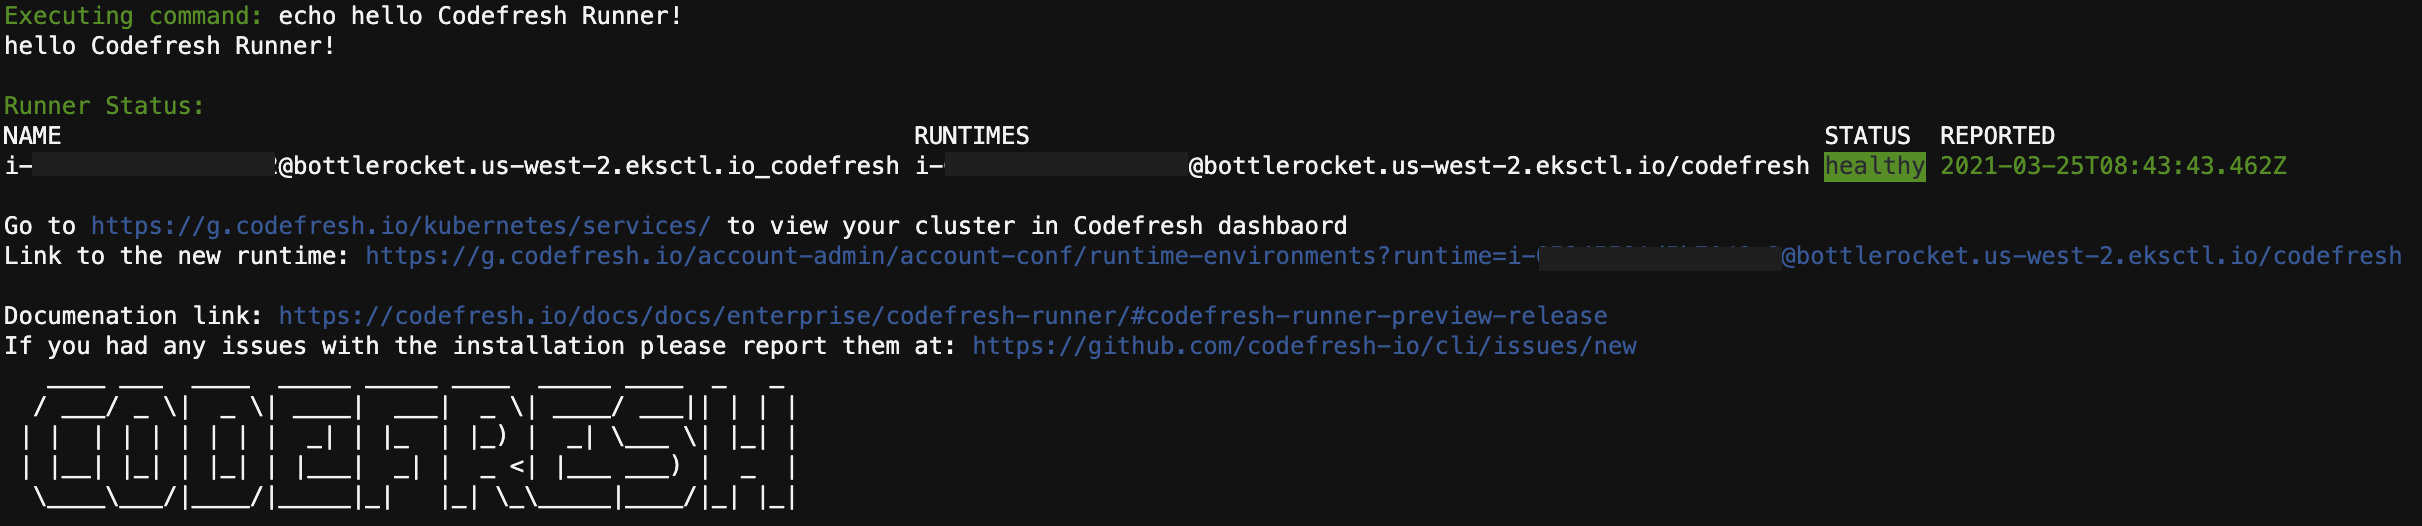 Codefresh-EKS-Bottlerocket-1